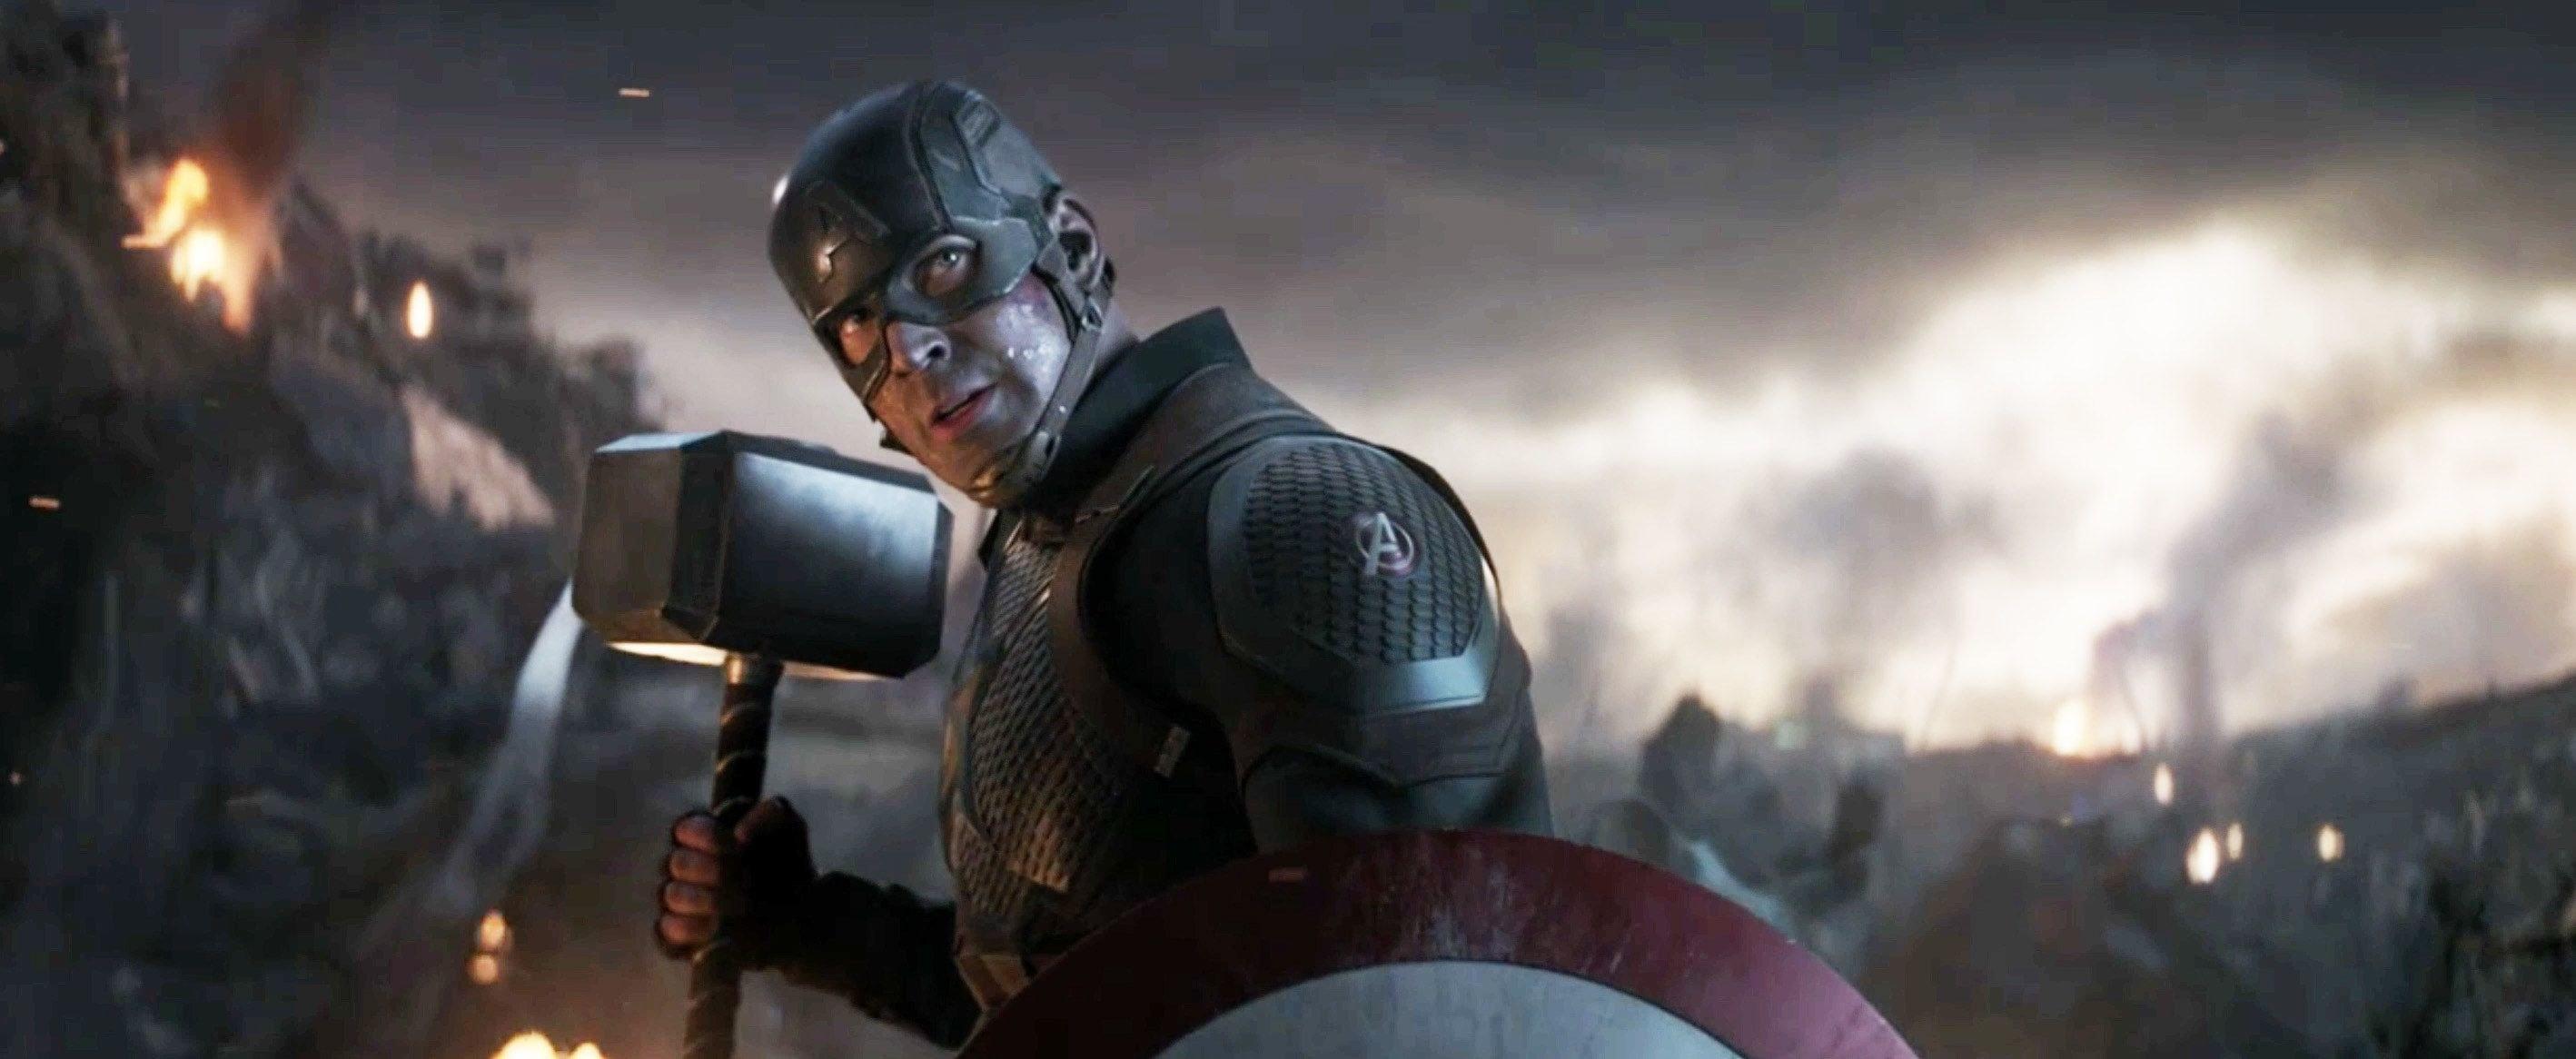 Captain American wielding Mjolnir in Endgame.